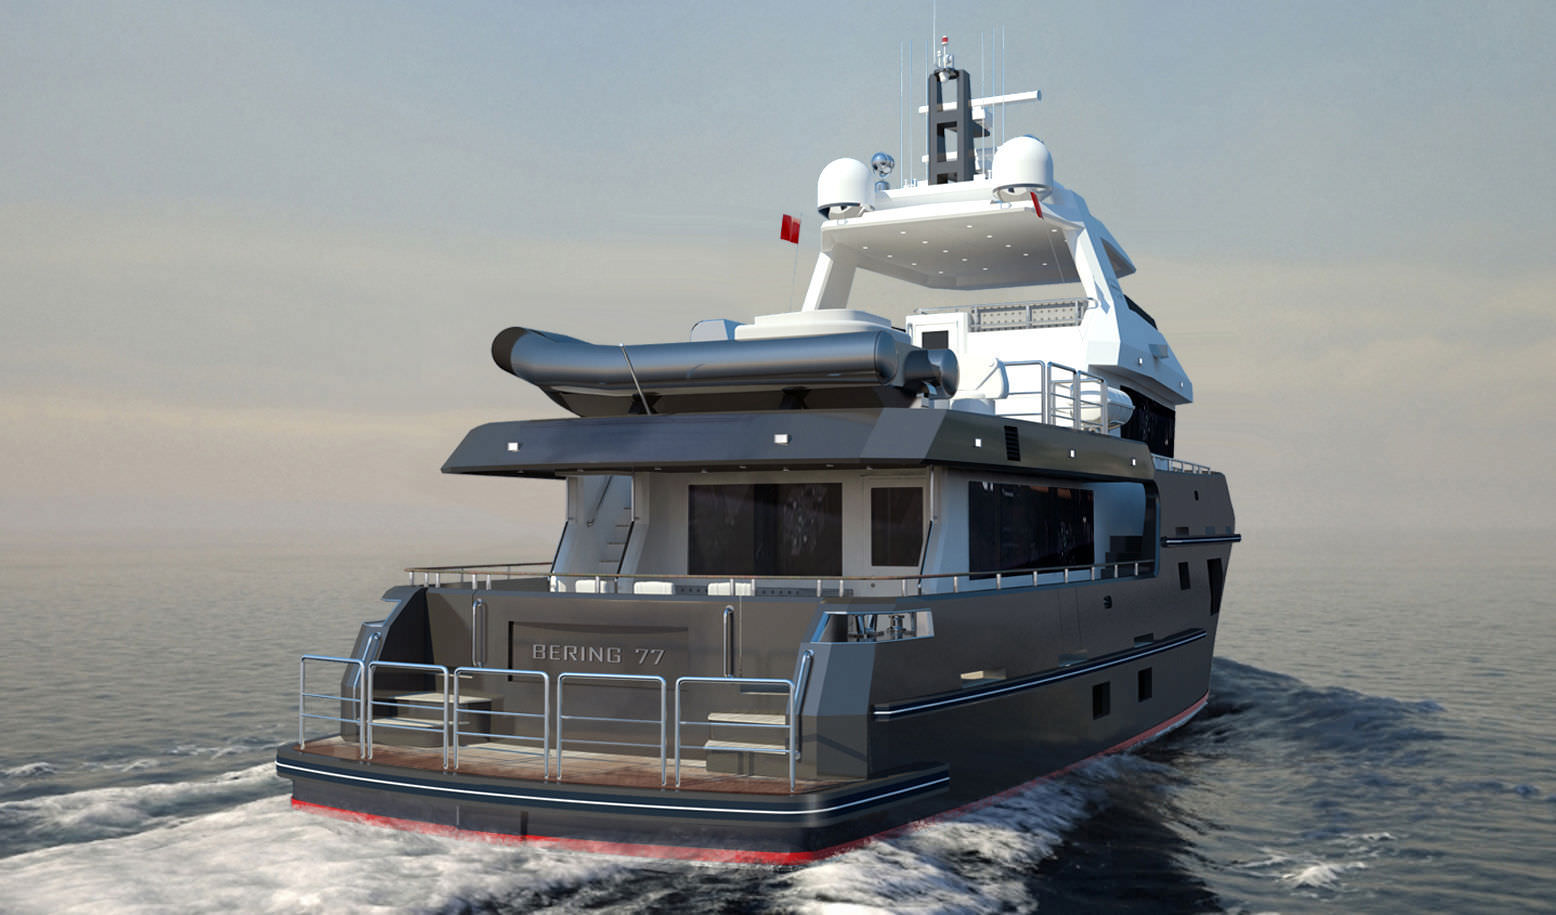 Expedition motor yacht / flybridge / steel / displacement